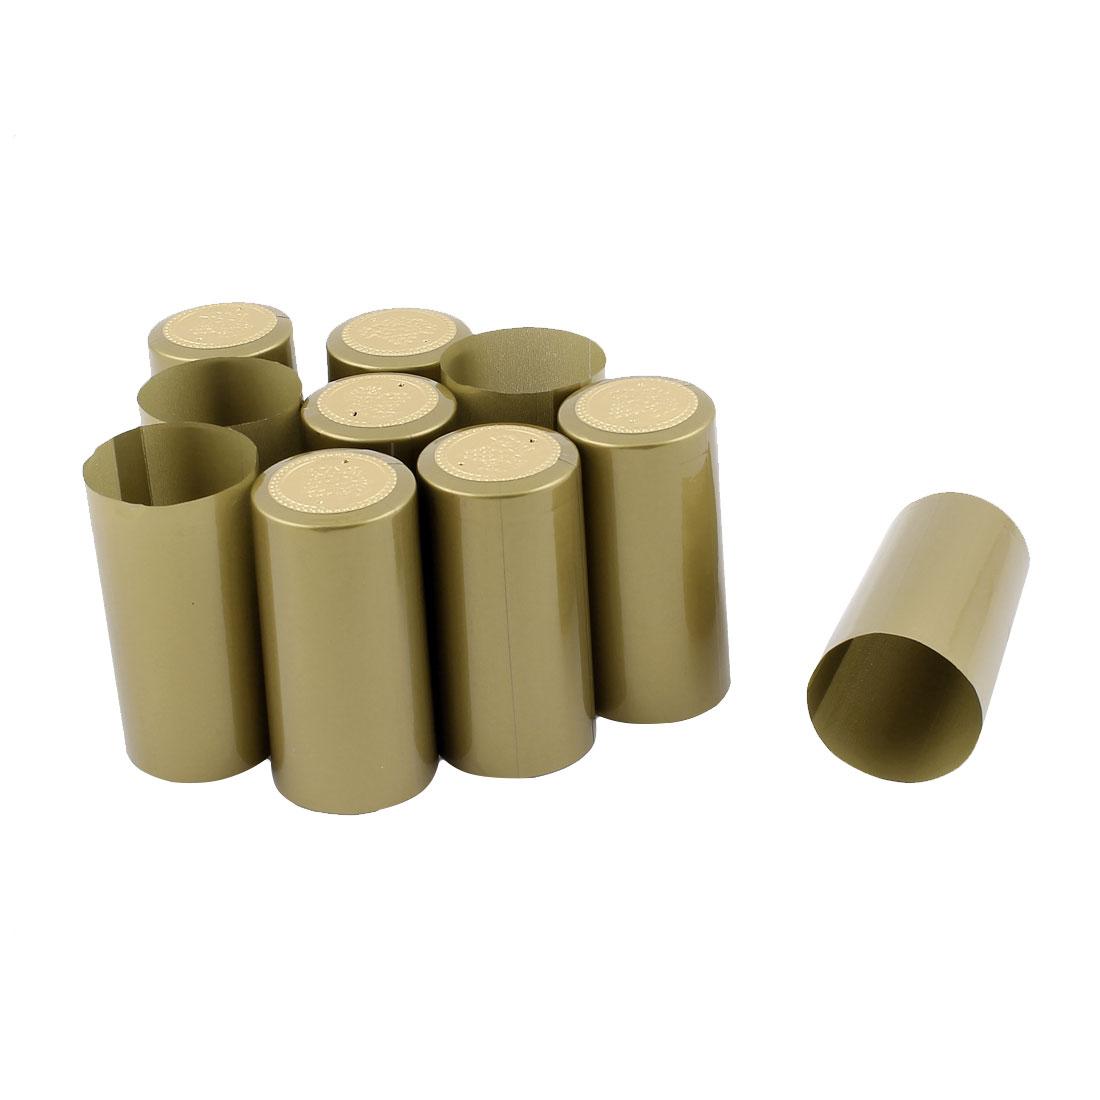 Winery Wine Bottle PVC Heat Shrink Caps Capsules Gold Tone 10 PCS